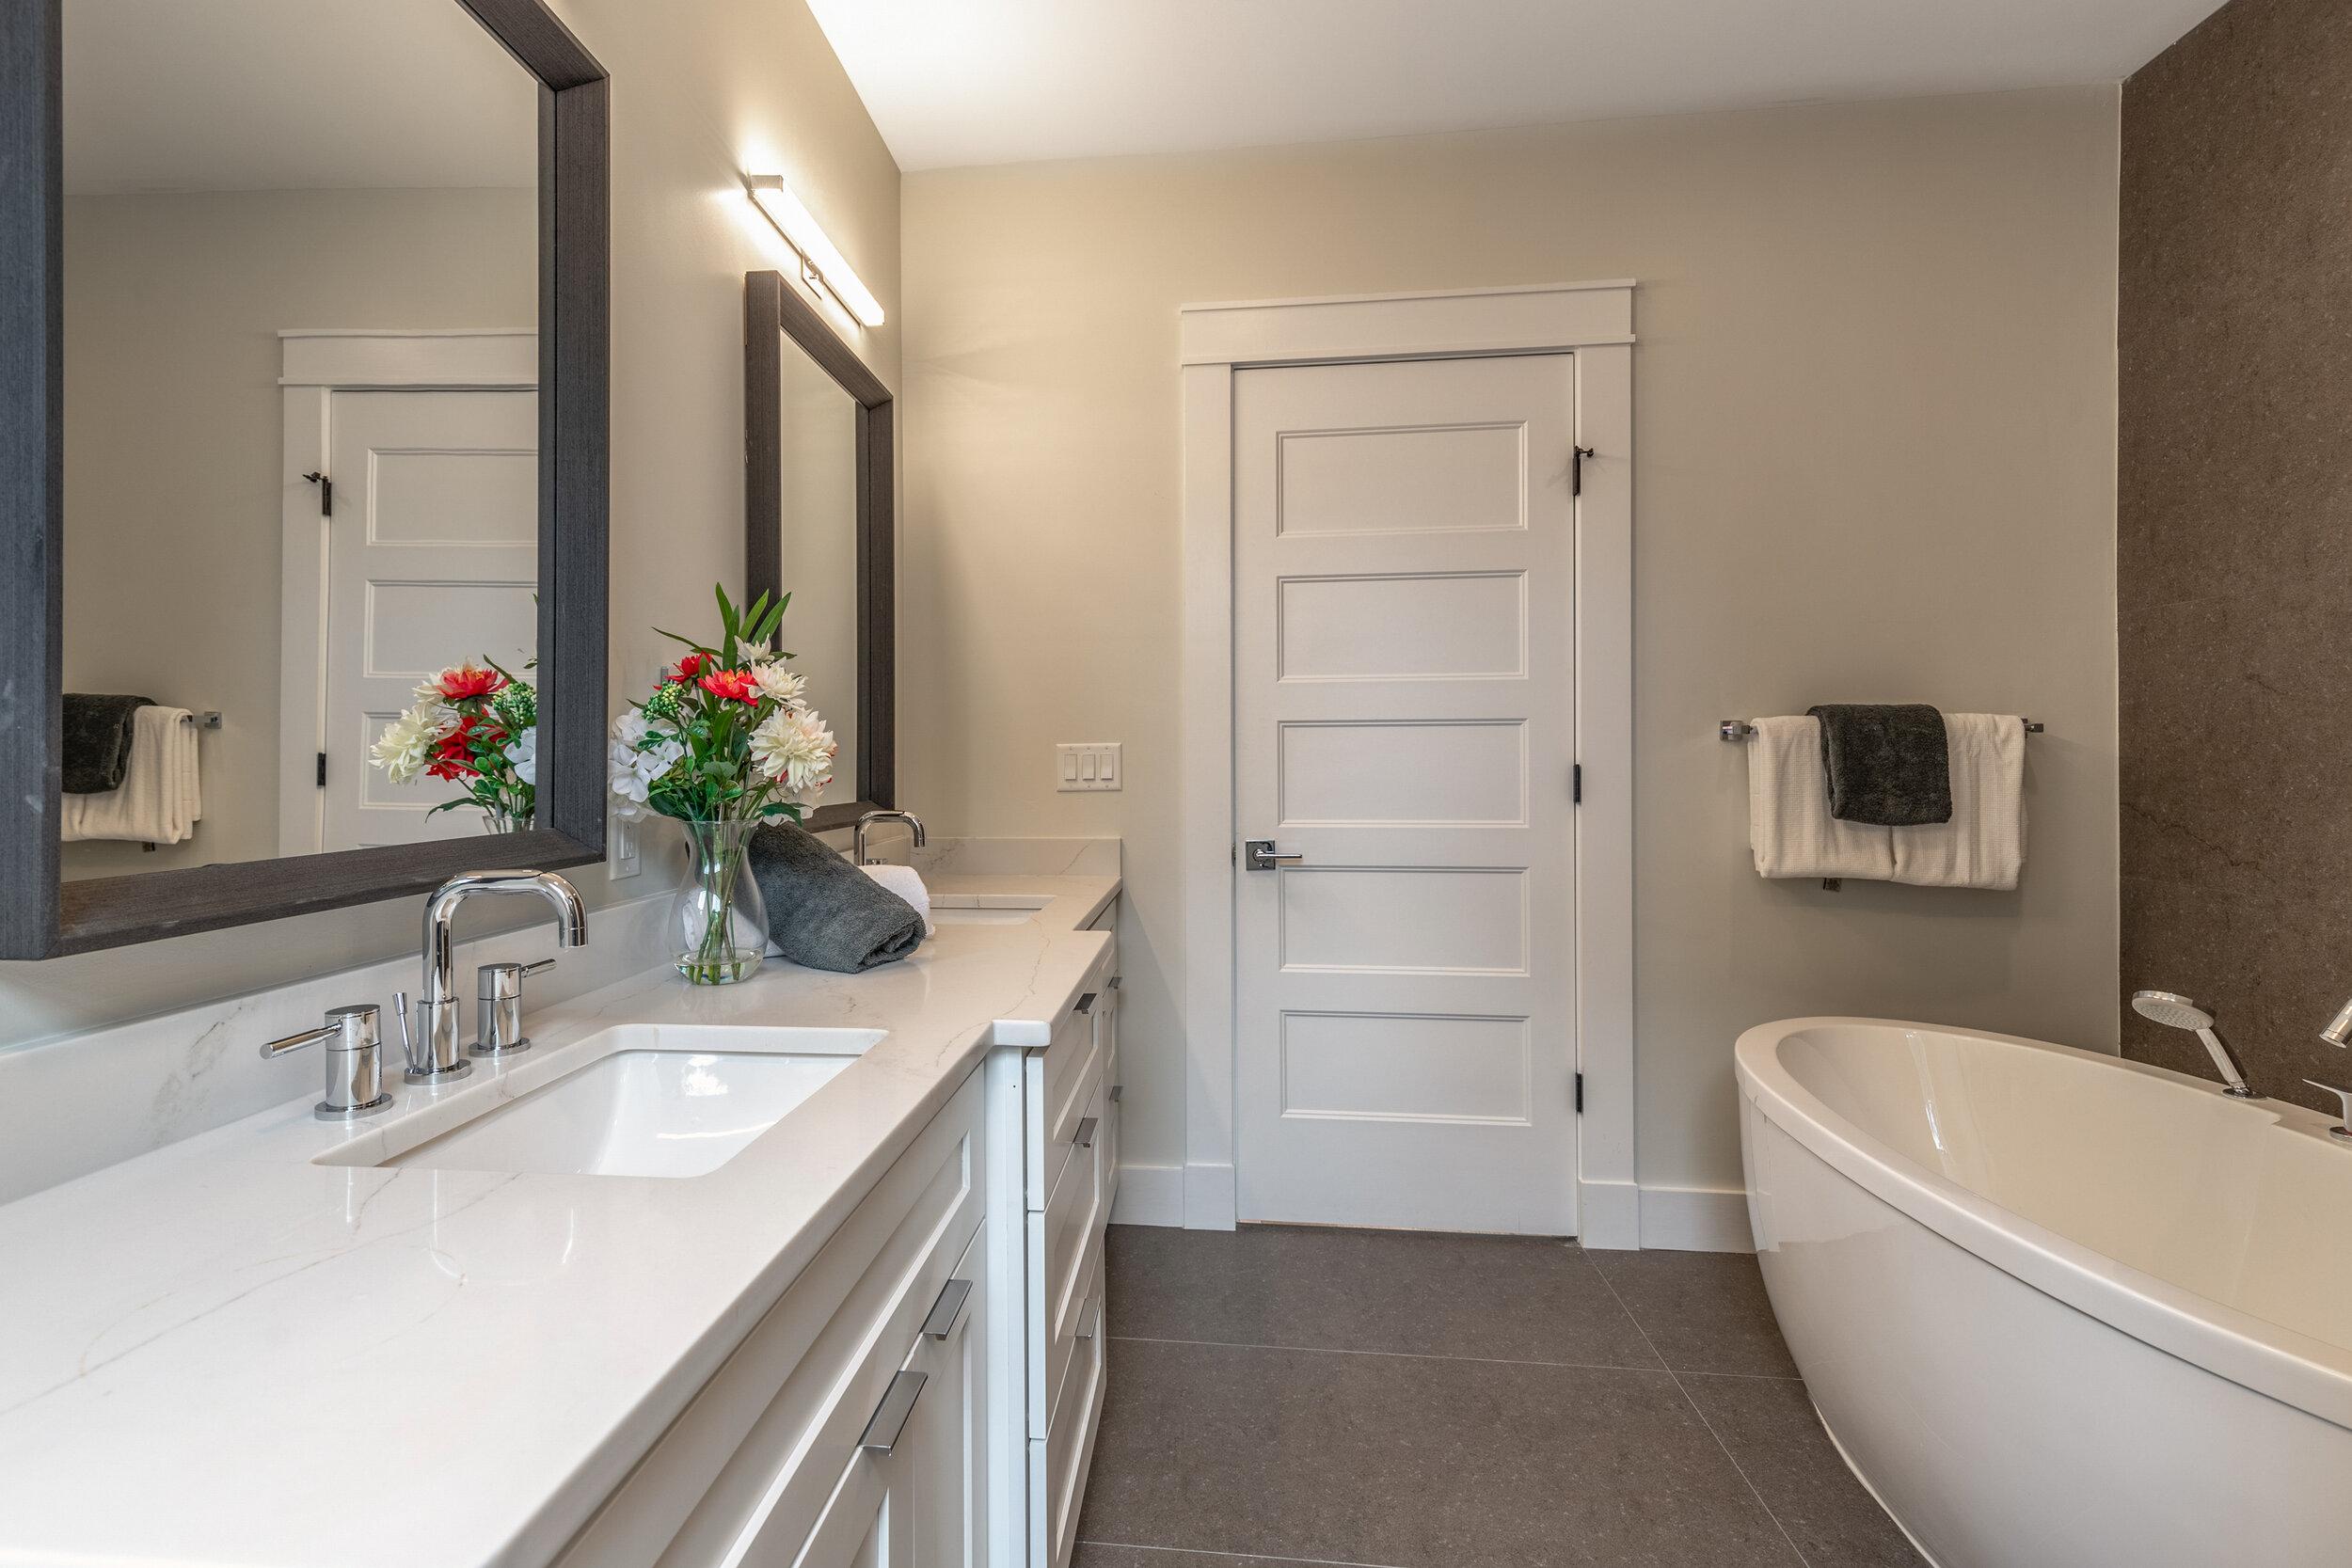 20_Bathroom-2.jpg